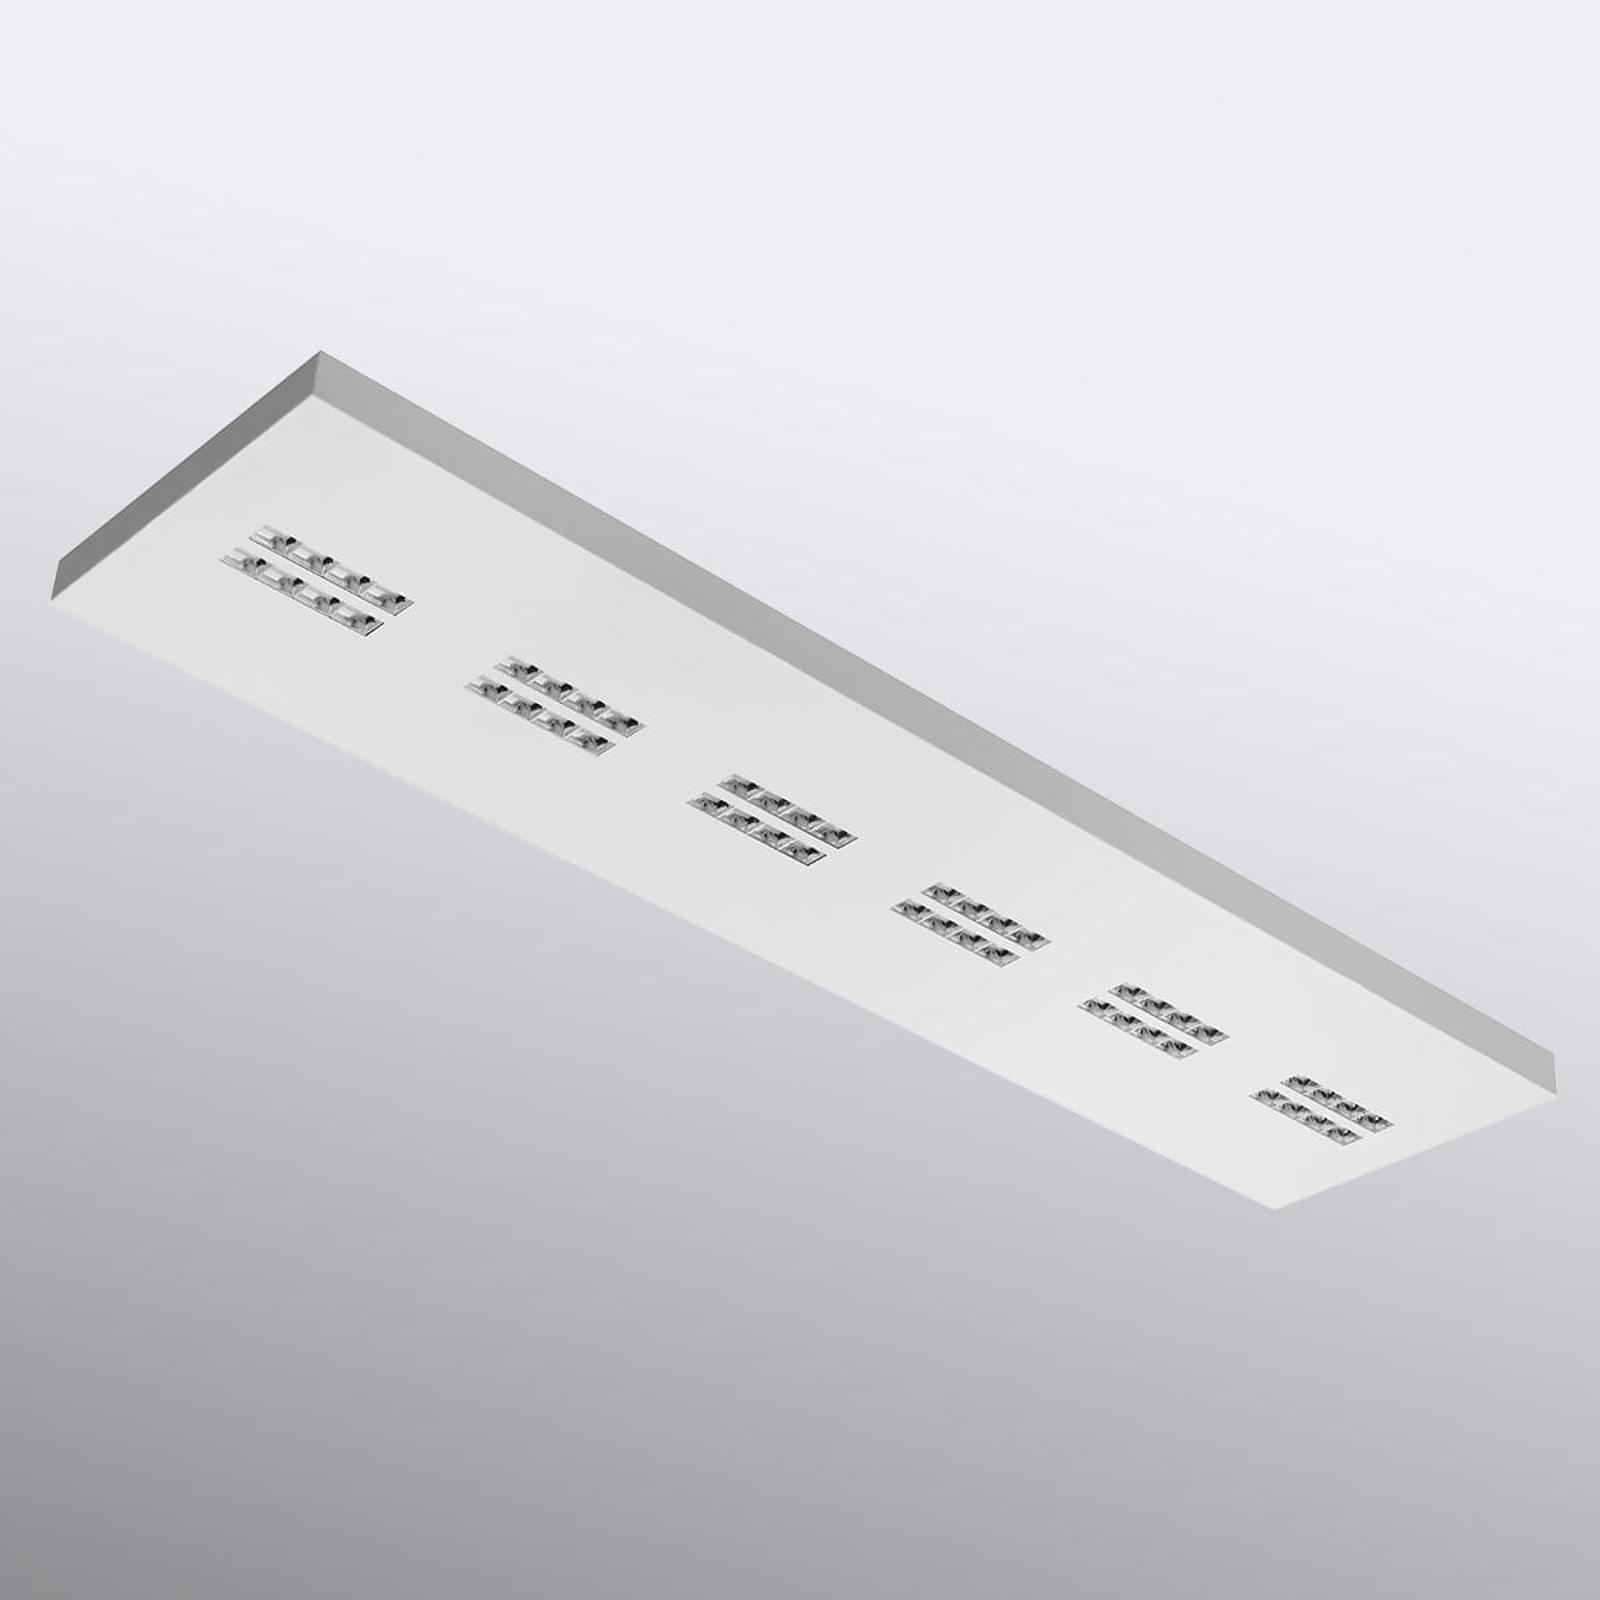 Rectangular ceiling lamp Declan II SS4, 4,000 K_7252095_1